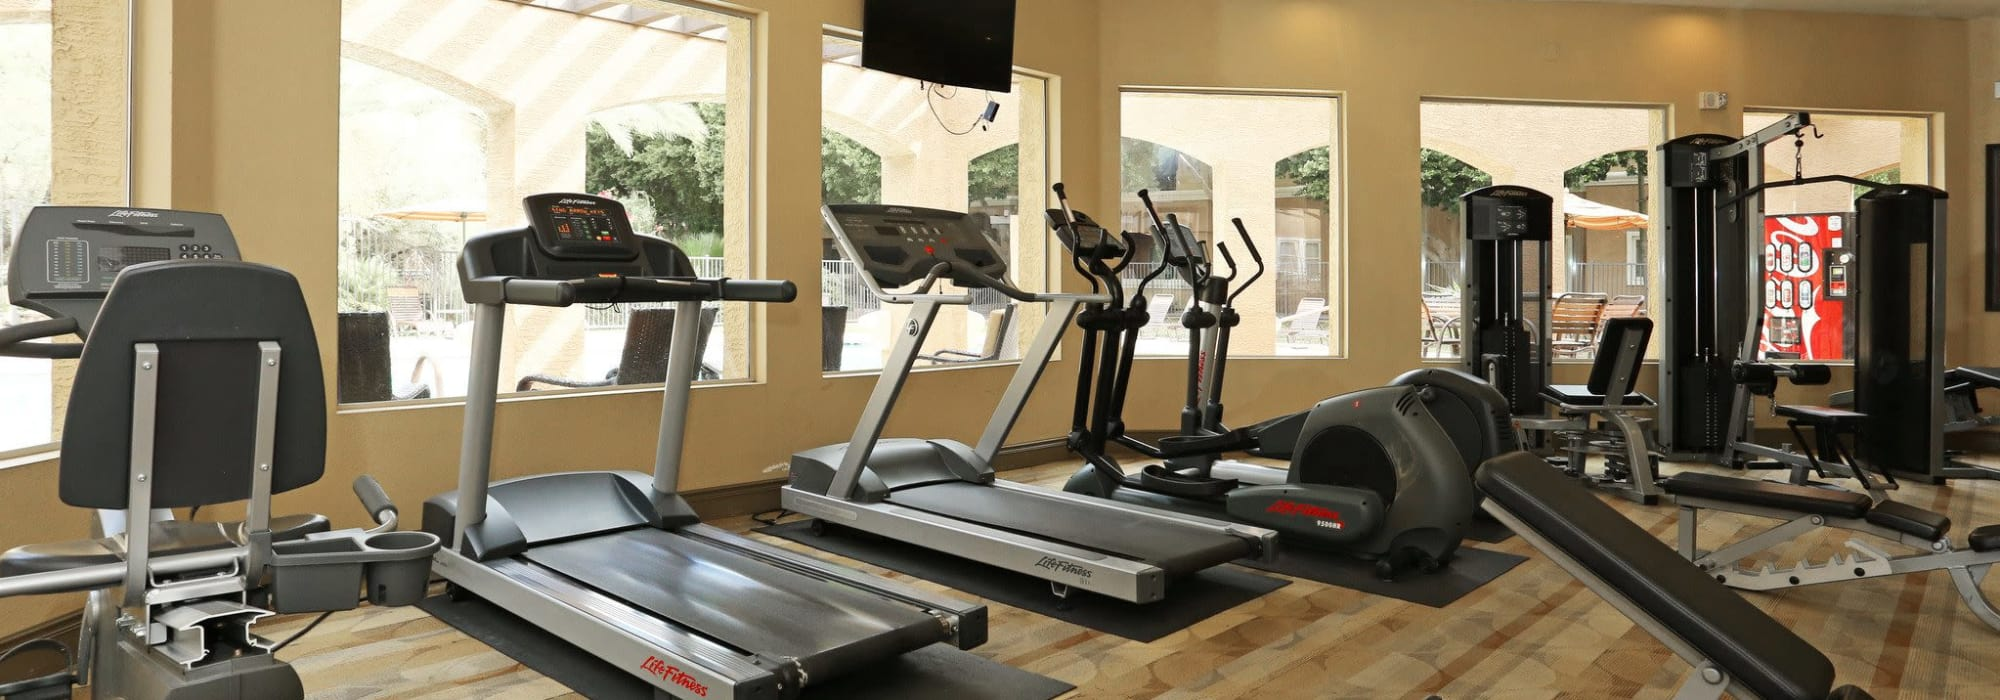 Fitness center at The Regents at Scottsdale in Scottsdale, Arizona